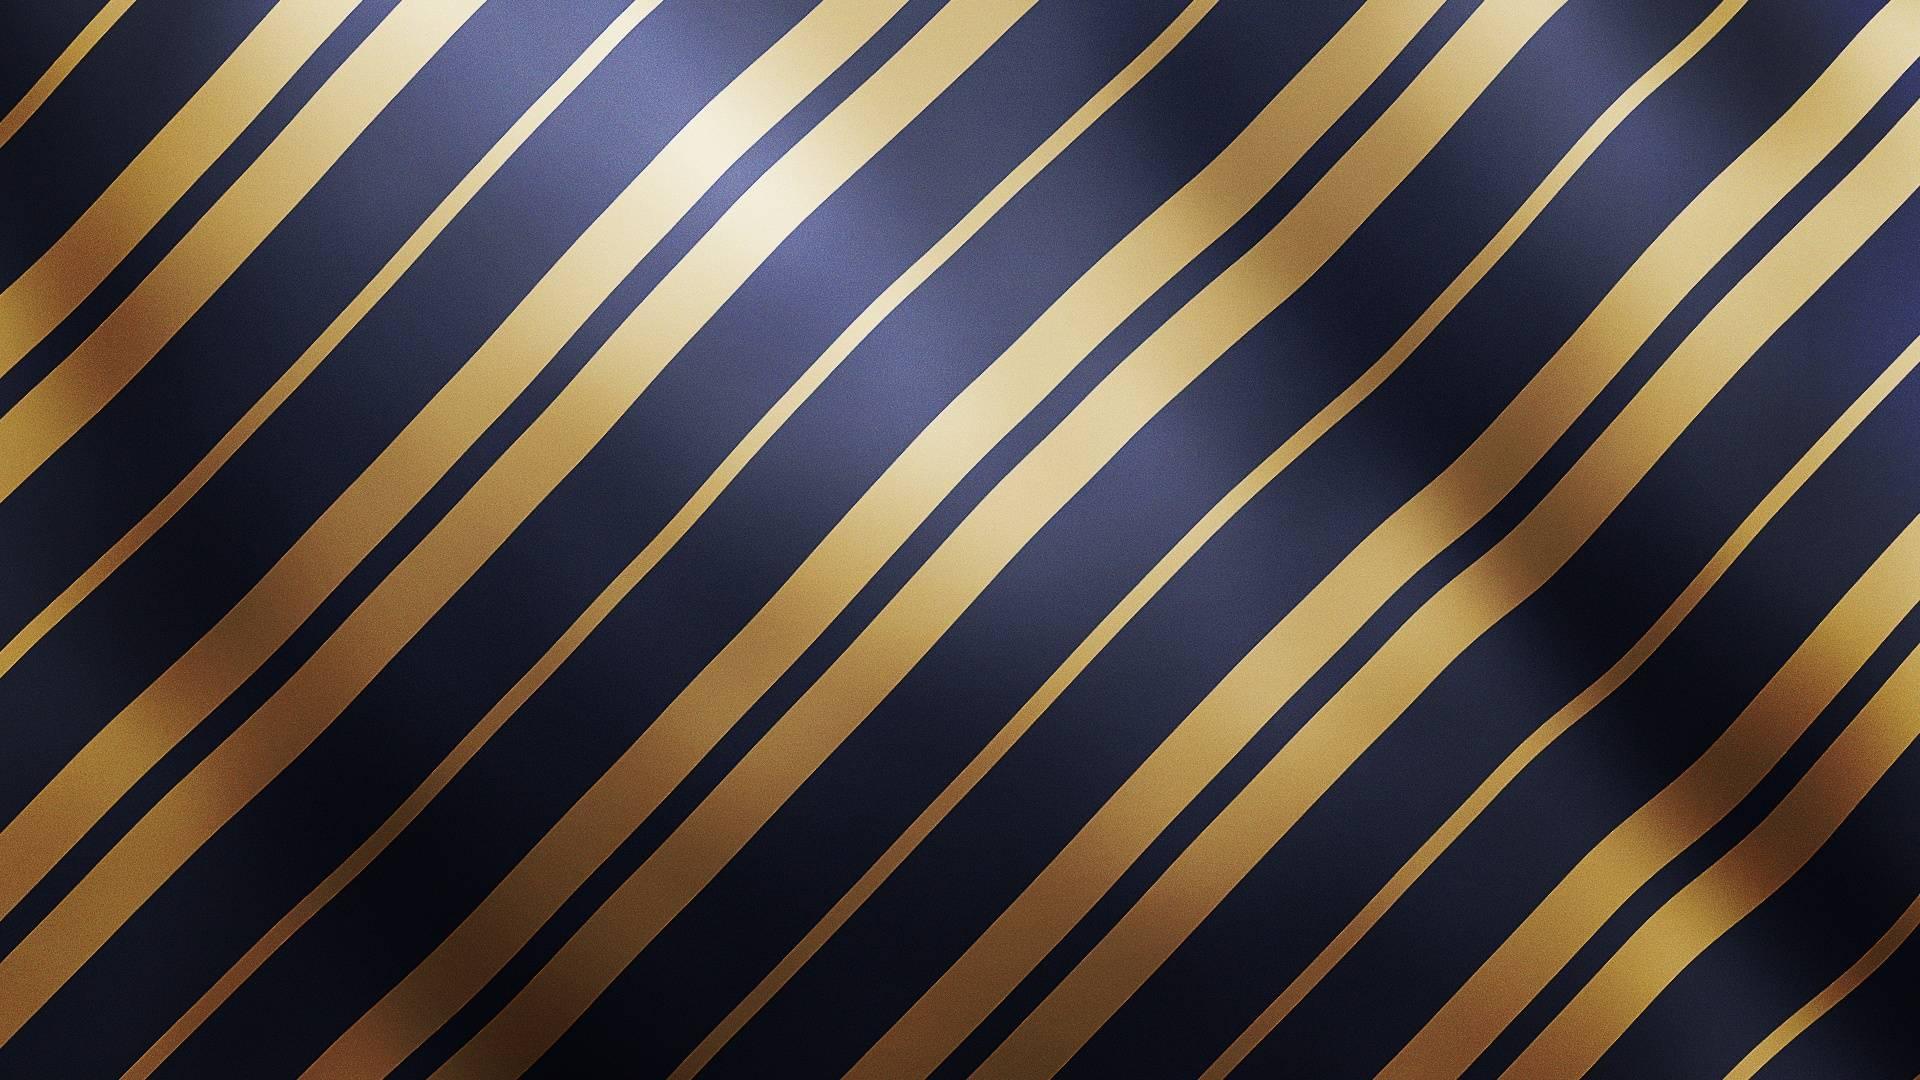 обои синий, золотой, полоски картинки фото